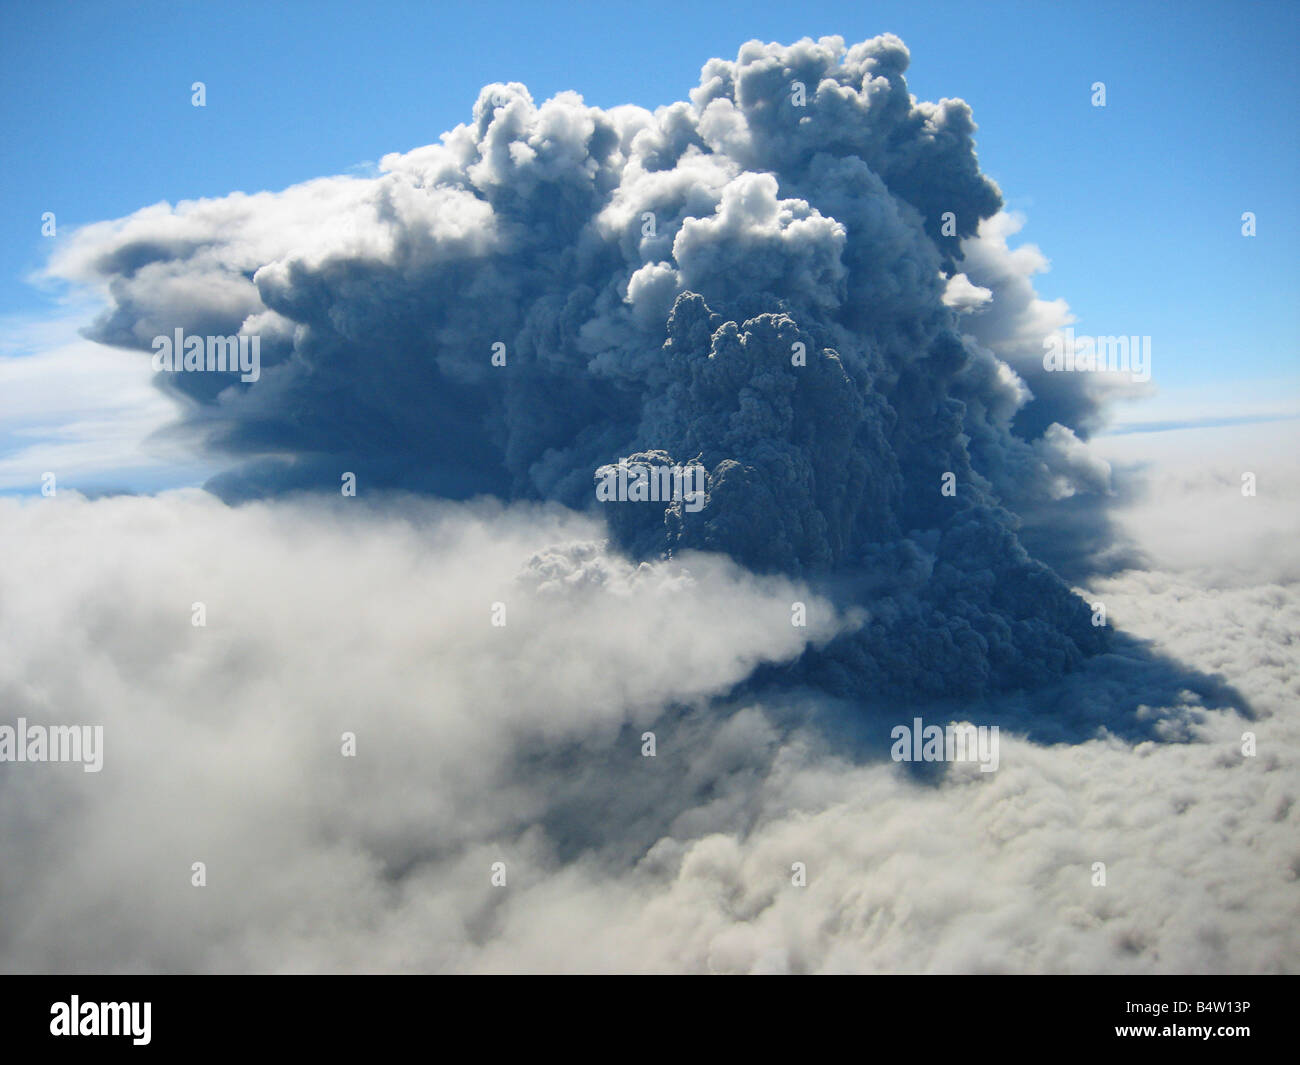 Eruption plume from Okmok Volcano, Alaska - Stock Image